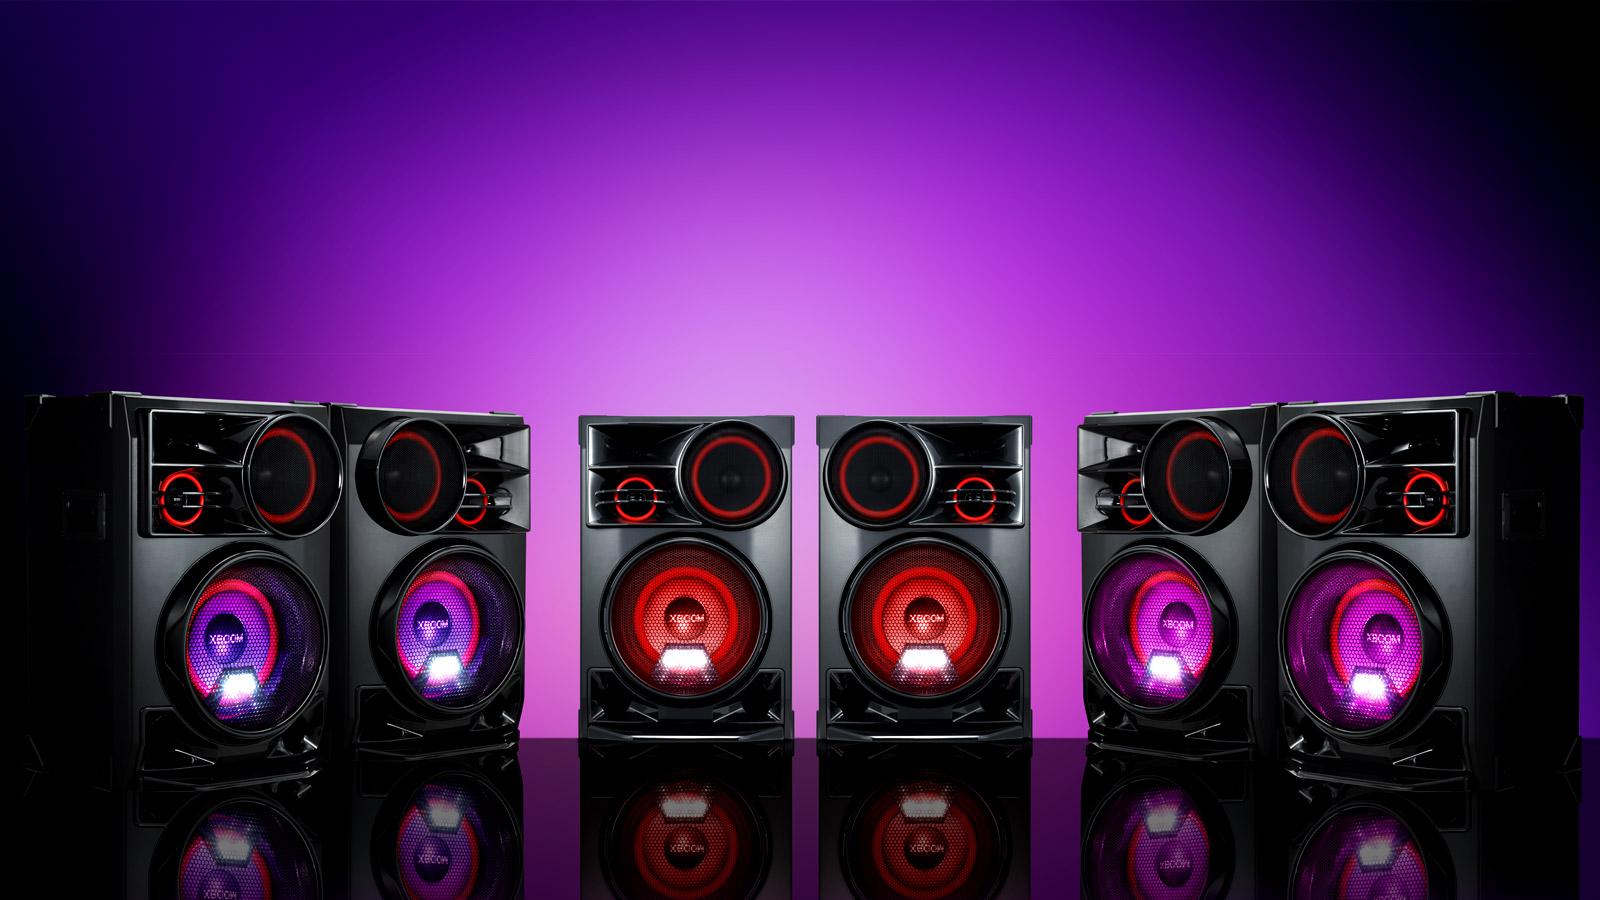 CAV-MiniAudio-CL98-02-Multi-Color-Lighting-Desktop